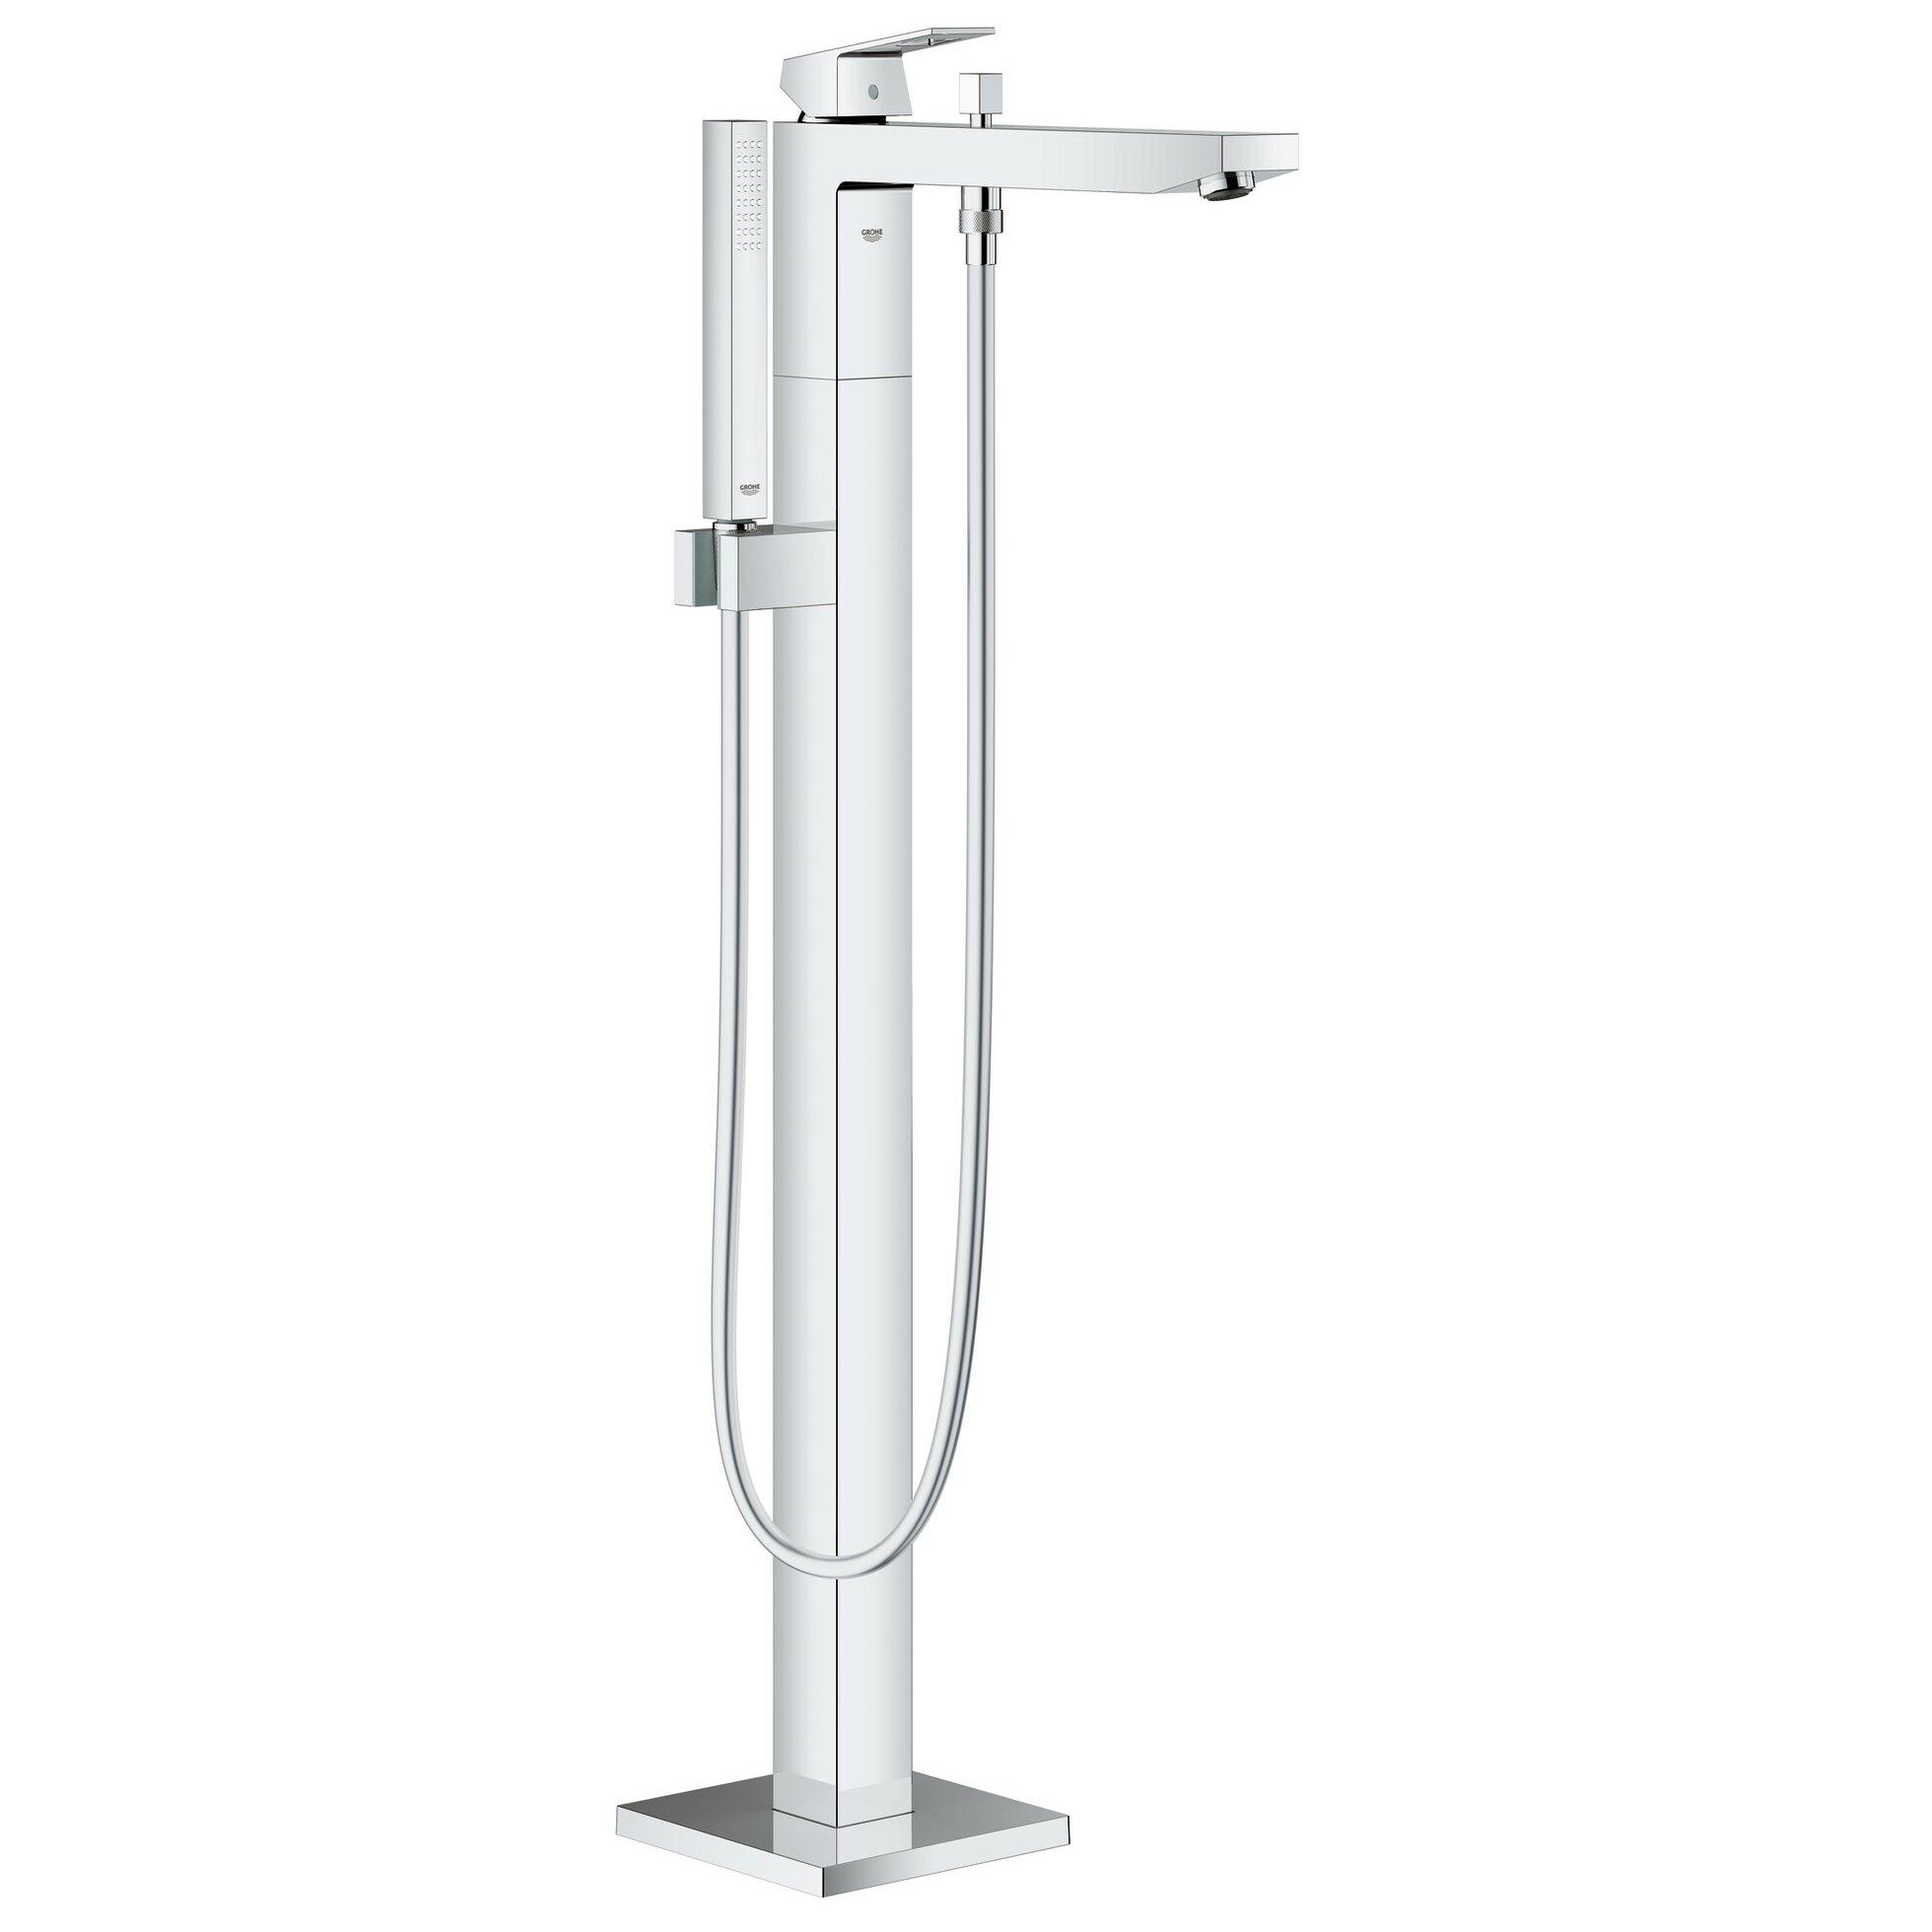 Grohe Eurocube Floor Mounted Tub Filler Trim with Hand Shower ... - Grohe Eurocube Floor Mounted Tub Filler Trim with Hand Shower